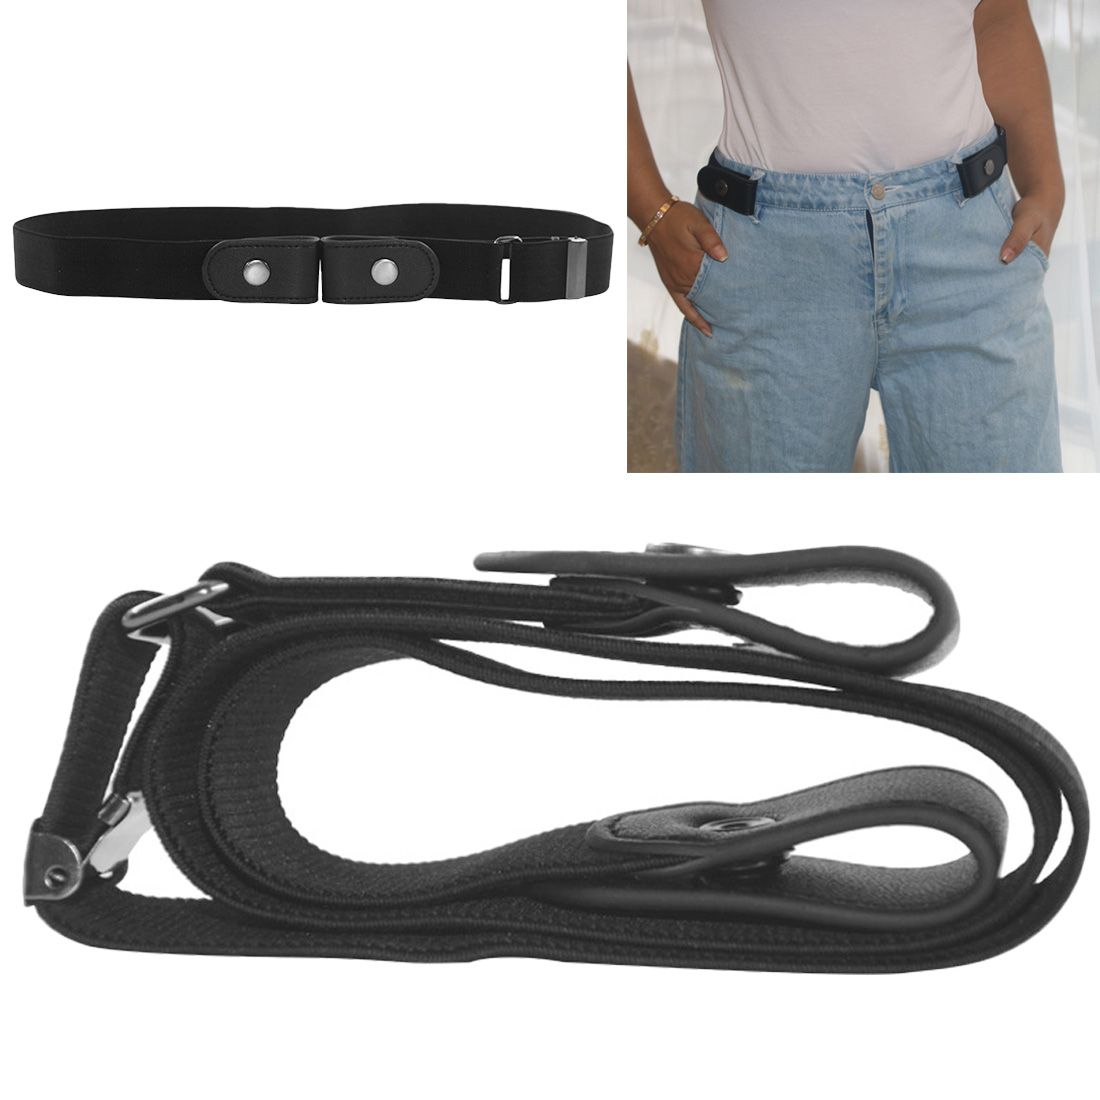 Buckle-Free Belt For Jean Pants Dresses No Buckle Stretch Elastic Waist Belt For Women And Men No Bulge No Hassle Waist Belt